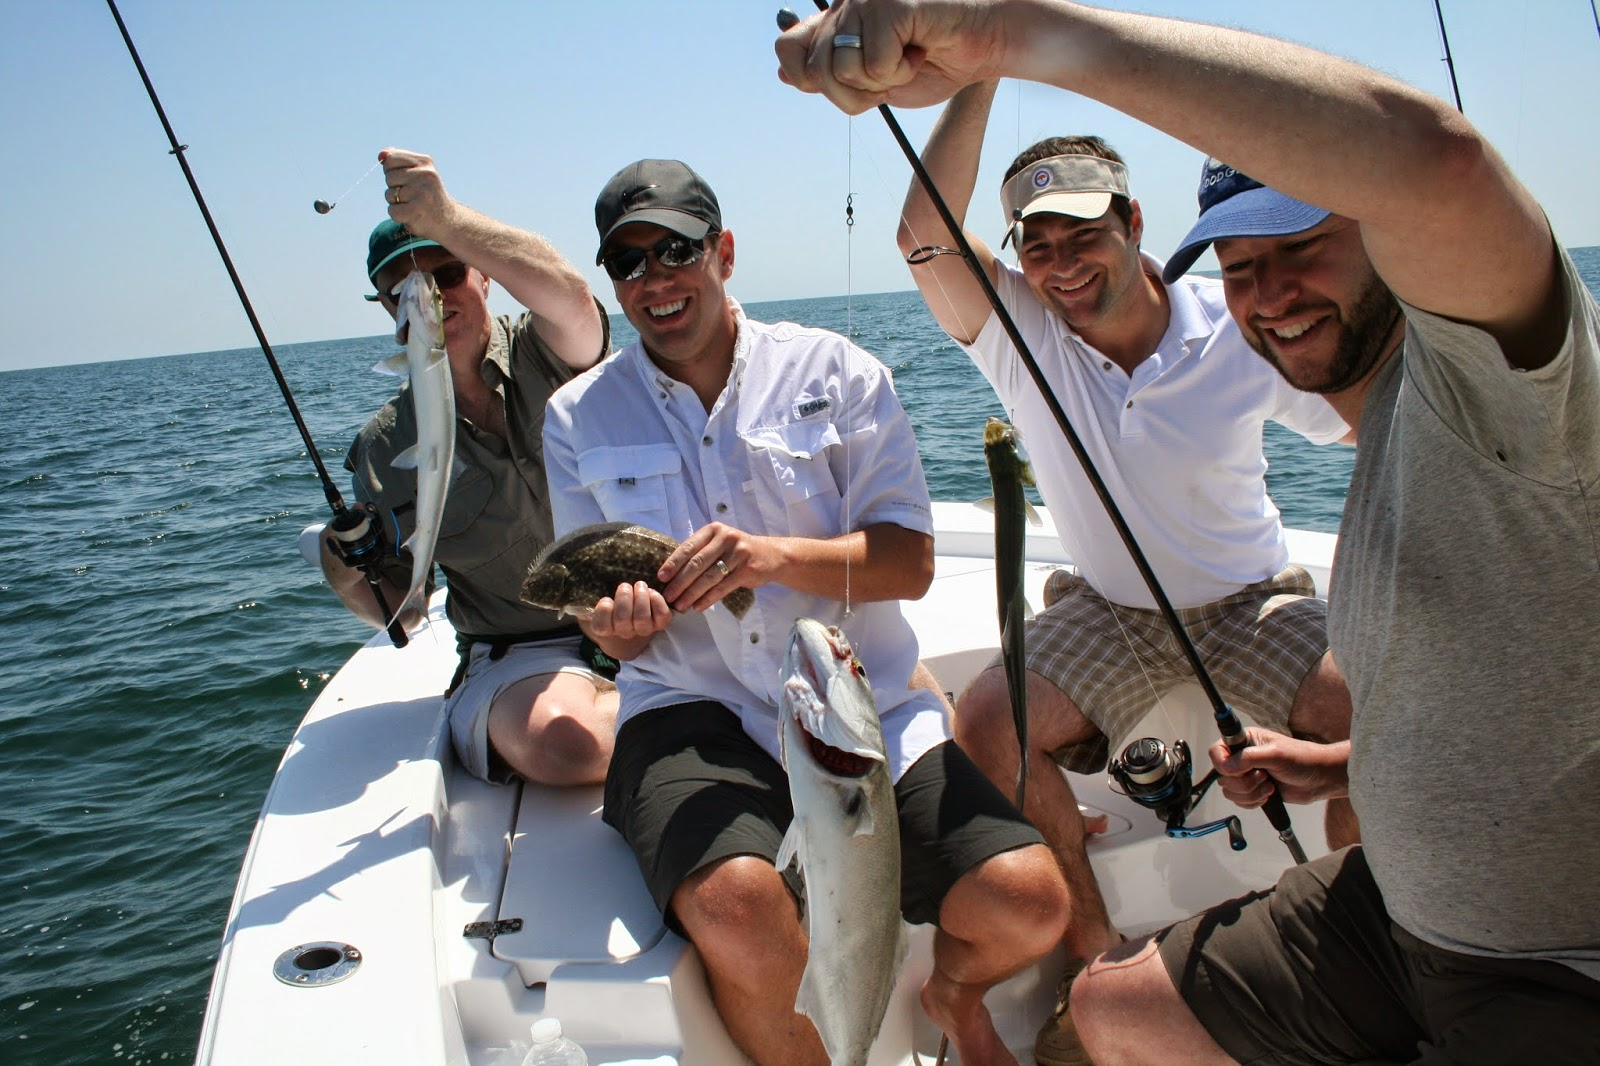 Affinity charters kiawah island reef fishing charter for Kiawah island fishing